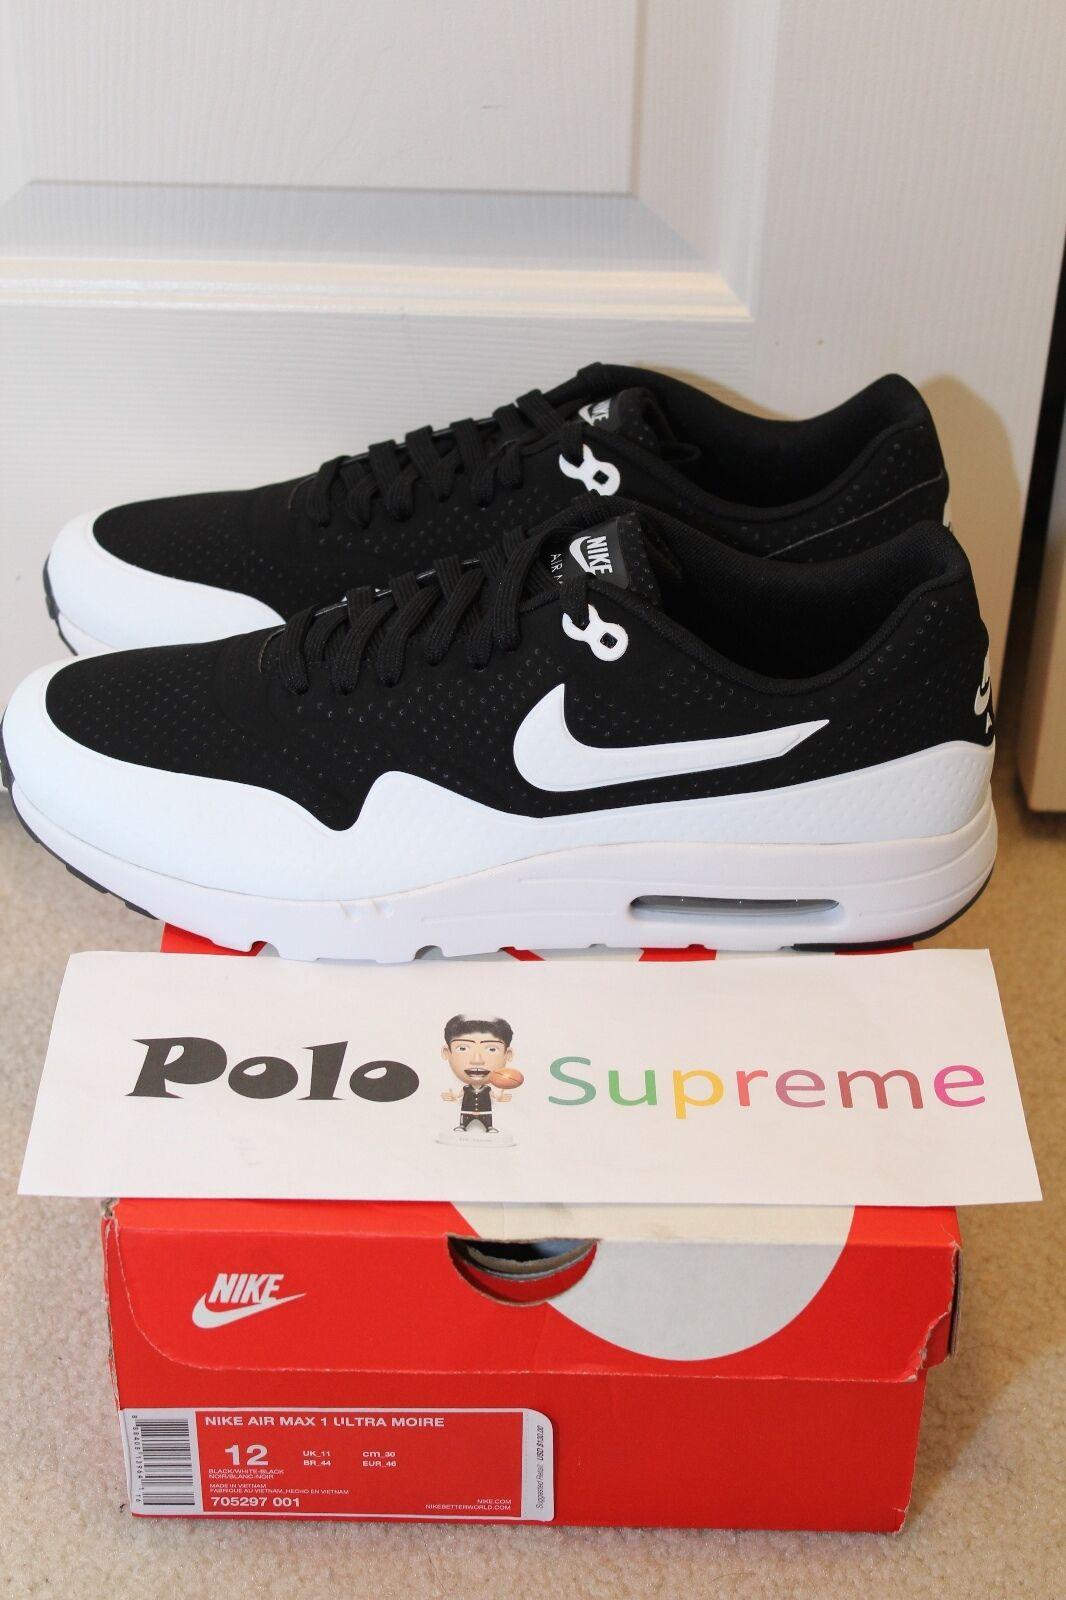 Nike air max 1 ultra bianco nero moiré 705297-001 panda oreo paura misura 9 - 12